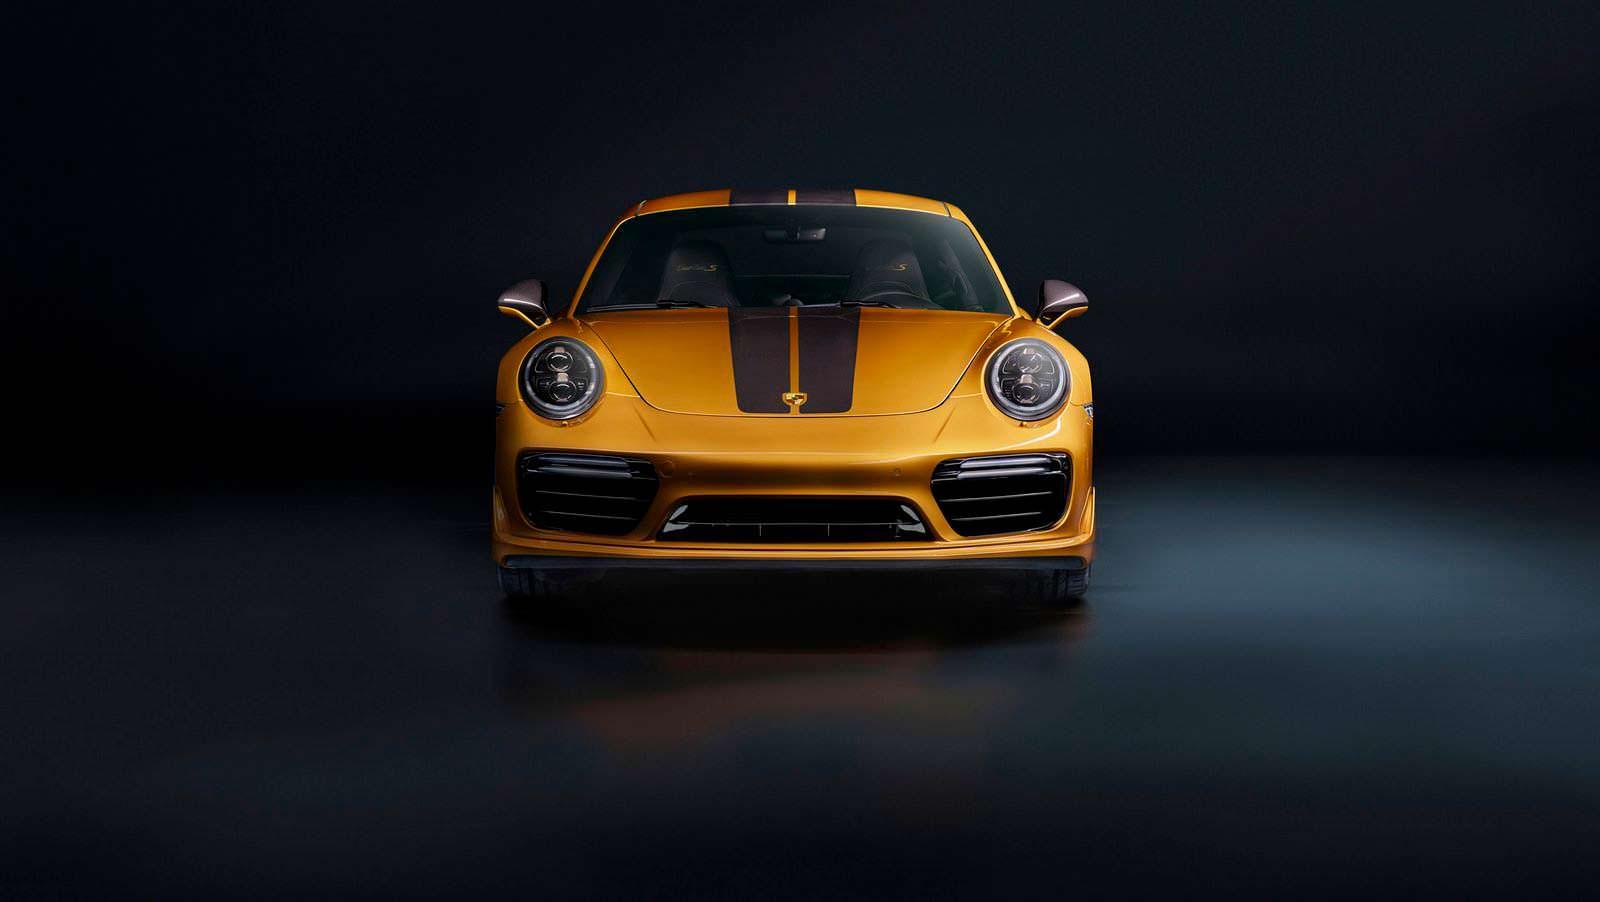 Самый быстрый Porsche 911 Turbo S Exclusive: только 500 штук